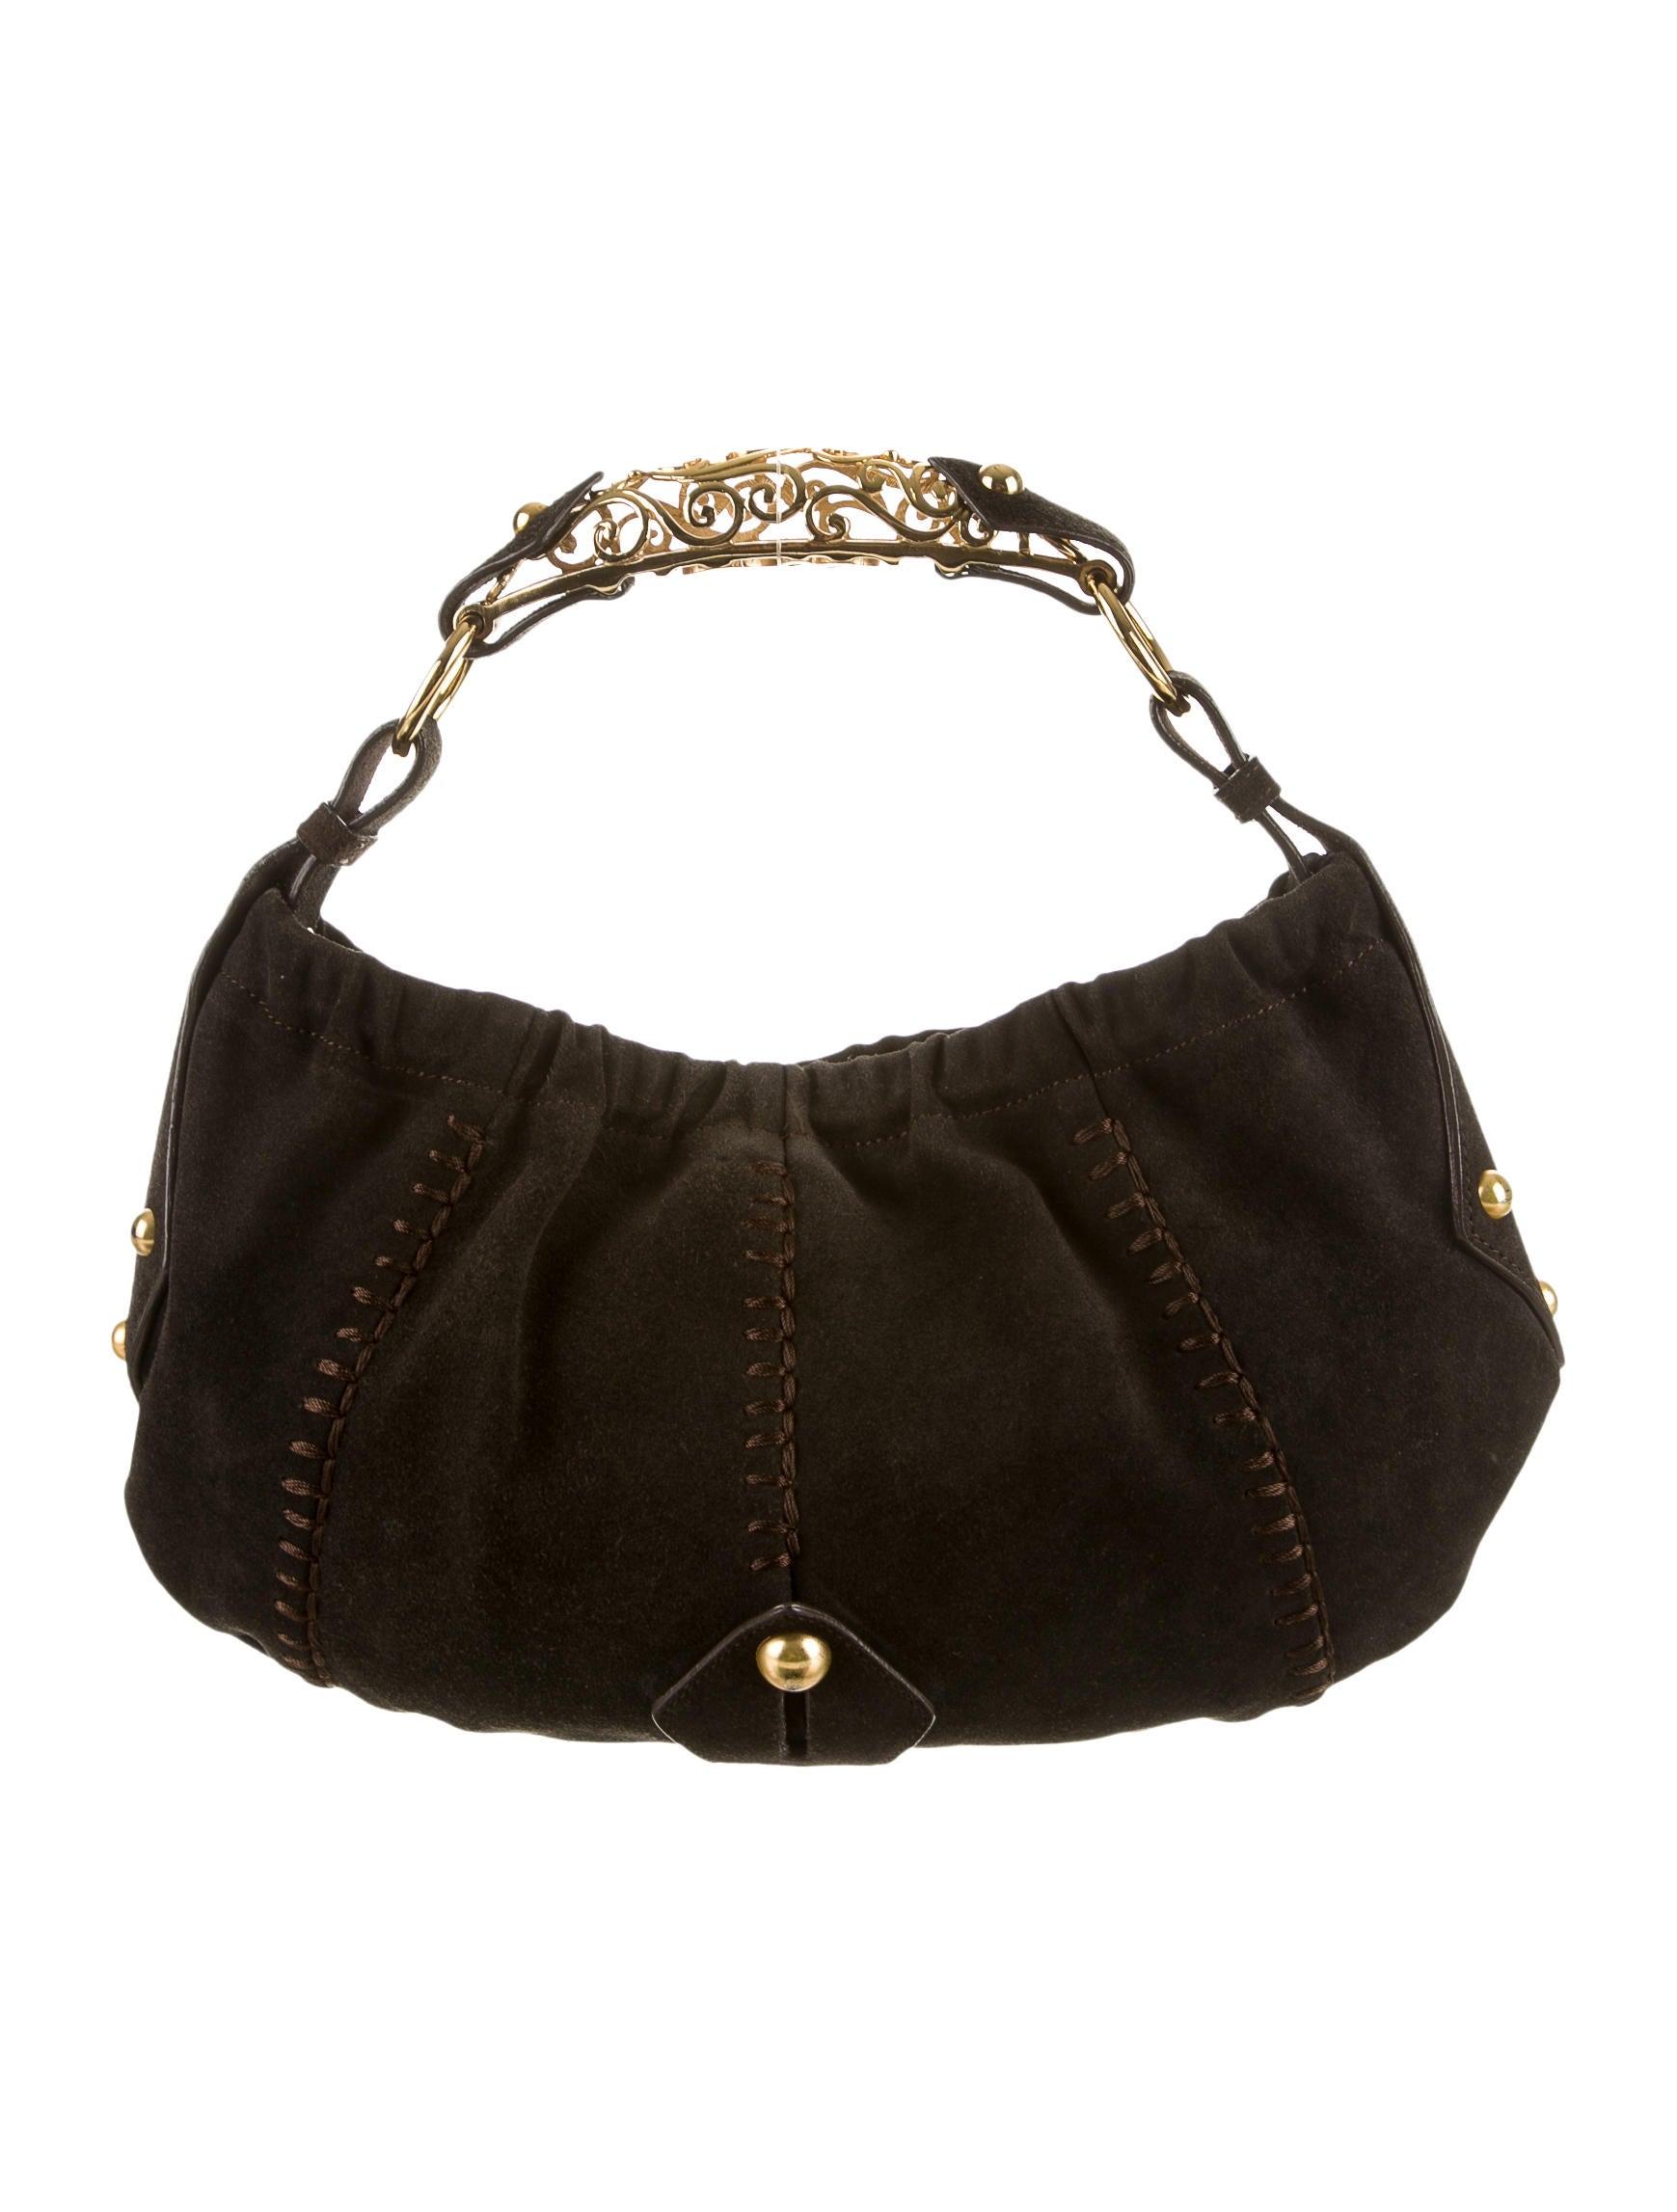 Yves Saint Laurent Vincennes Bag - Handbags - YVE36965 | The RealReal